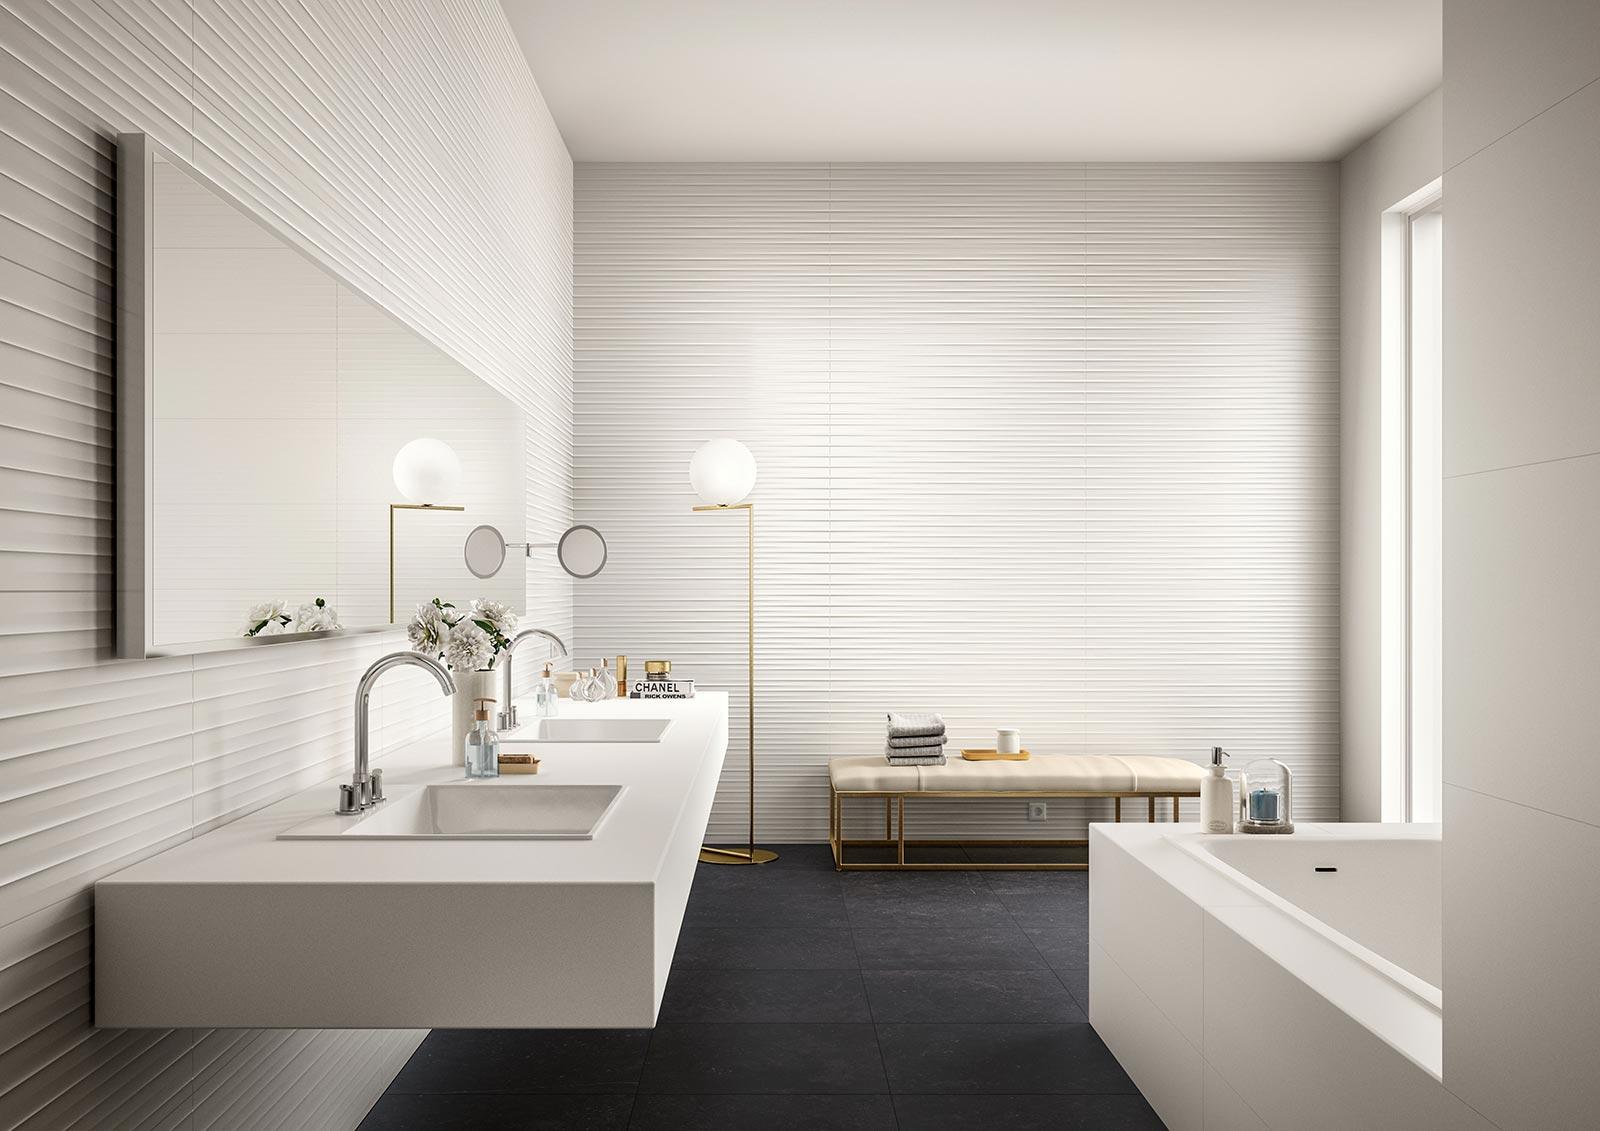 Carrelage salle de bain c ramique et gr s c rame marazzi for Salle de bain dijon